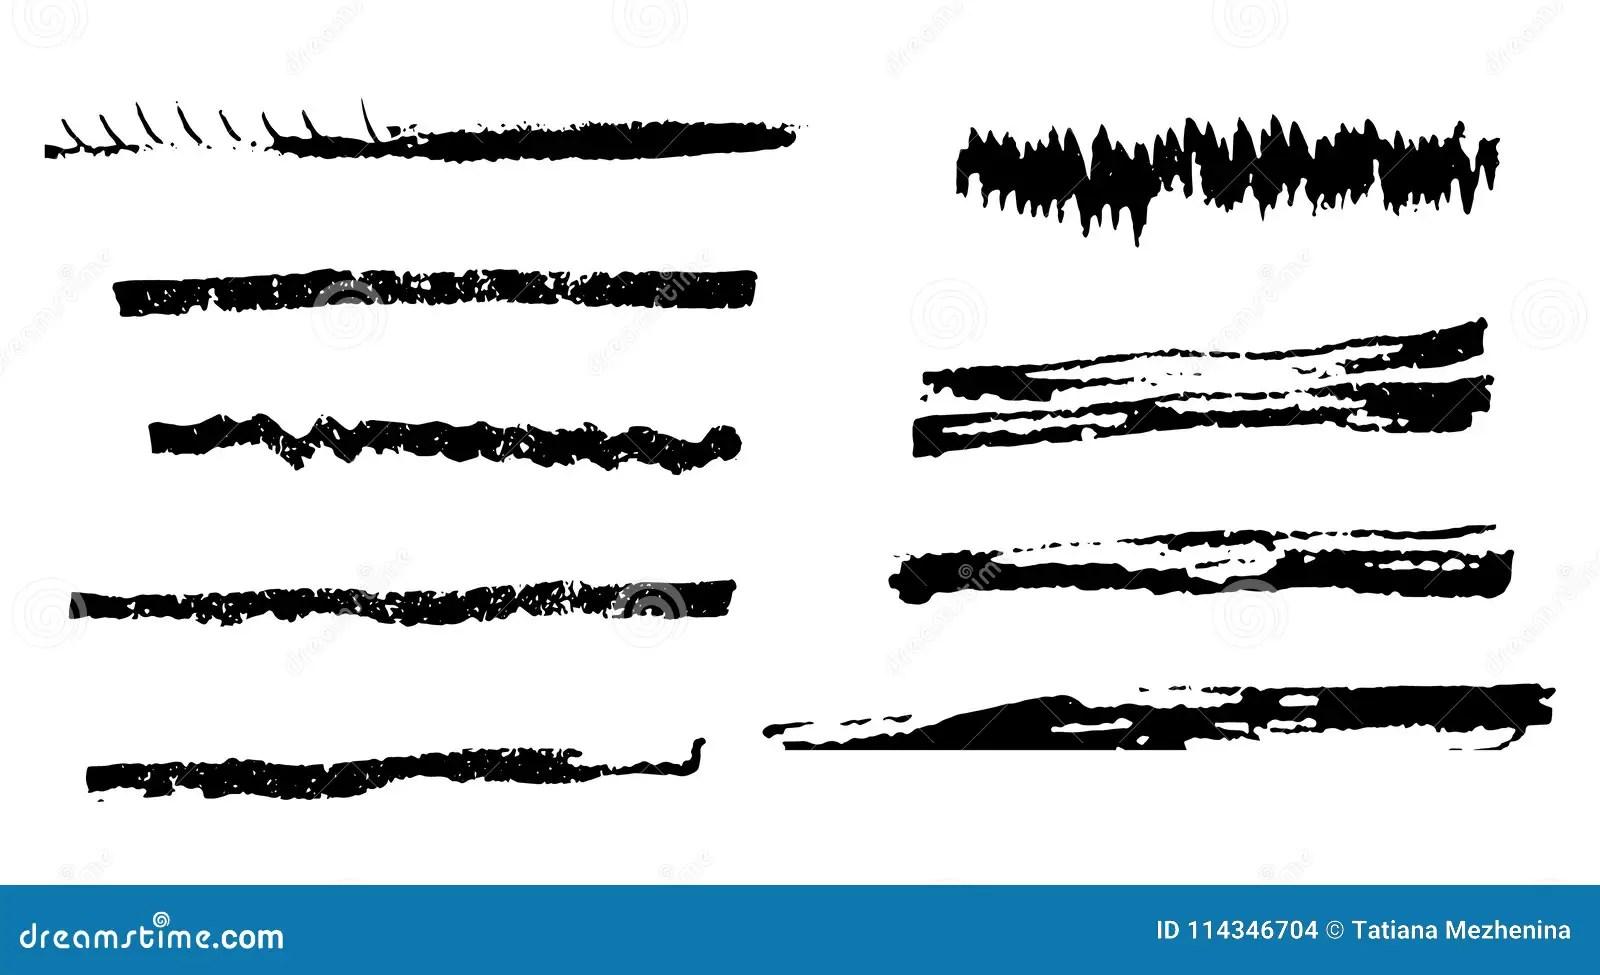 Ink Splat Overlay Cartoon Vector